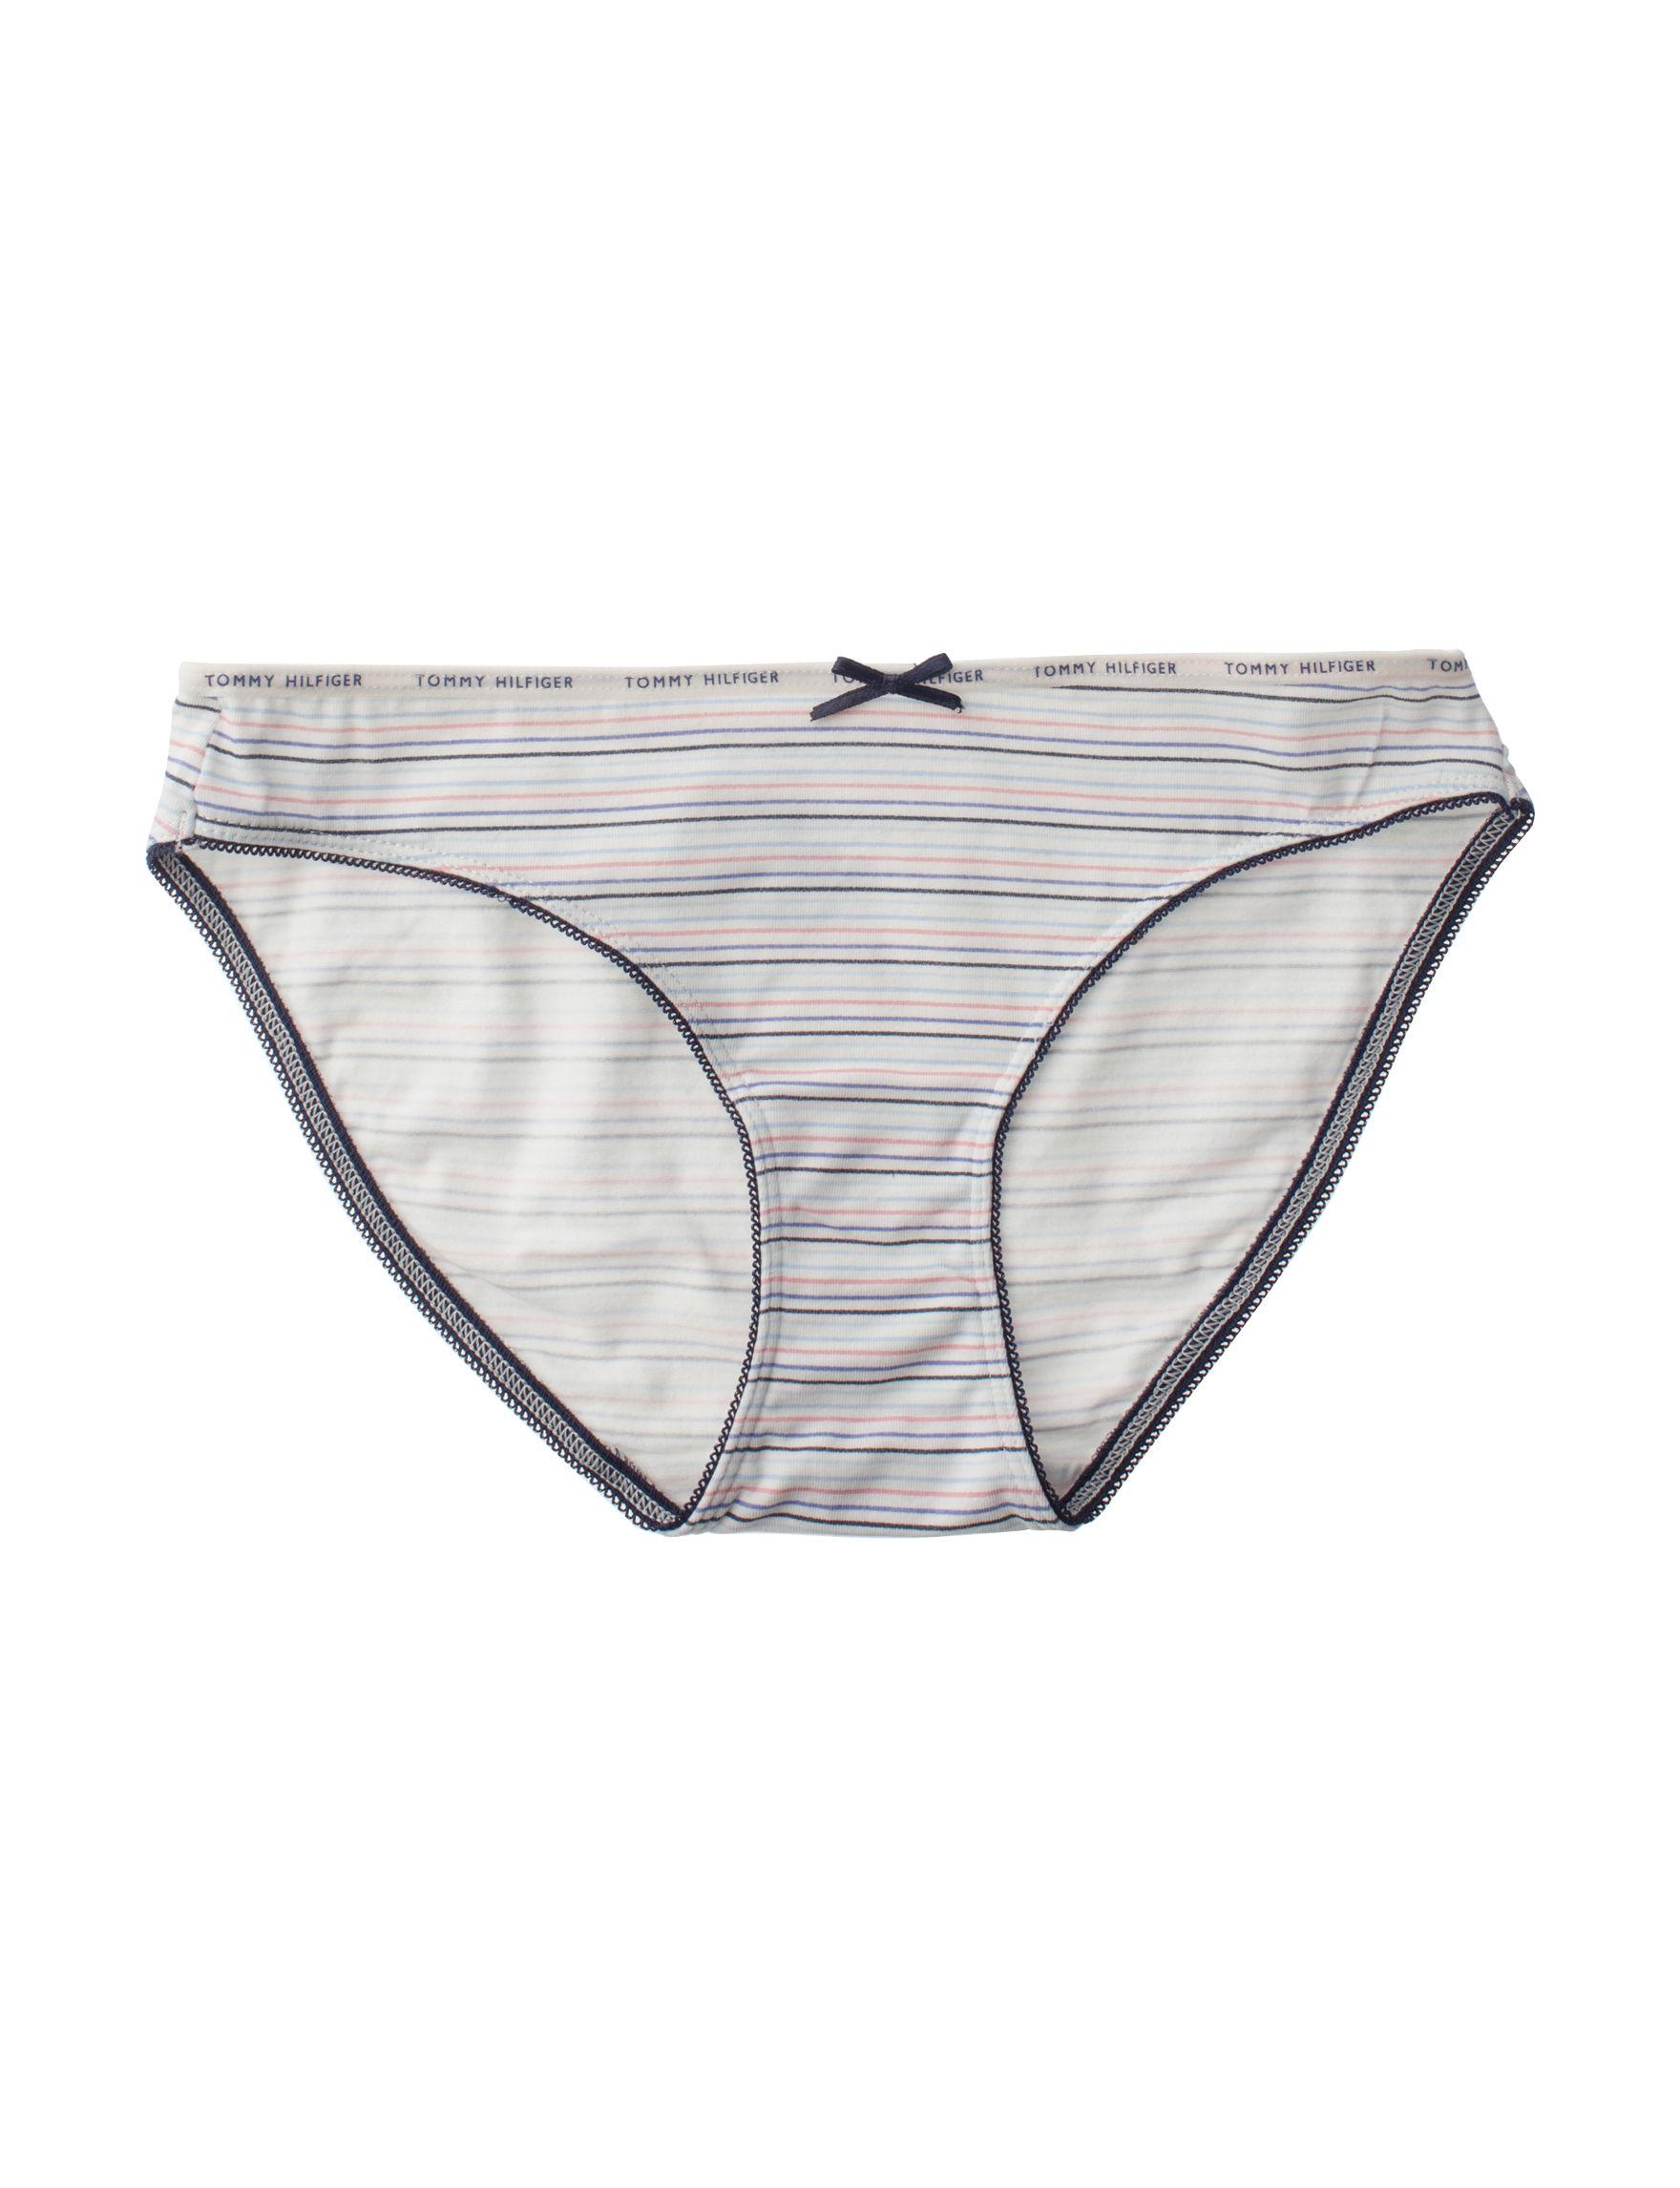 Tommy Hilfiger Black Panties Bikini